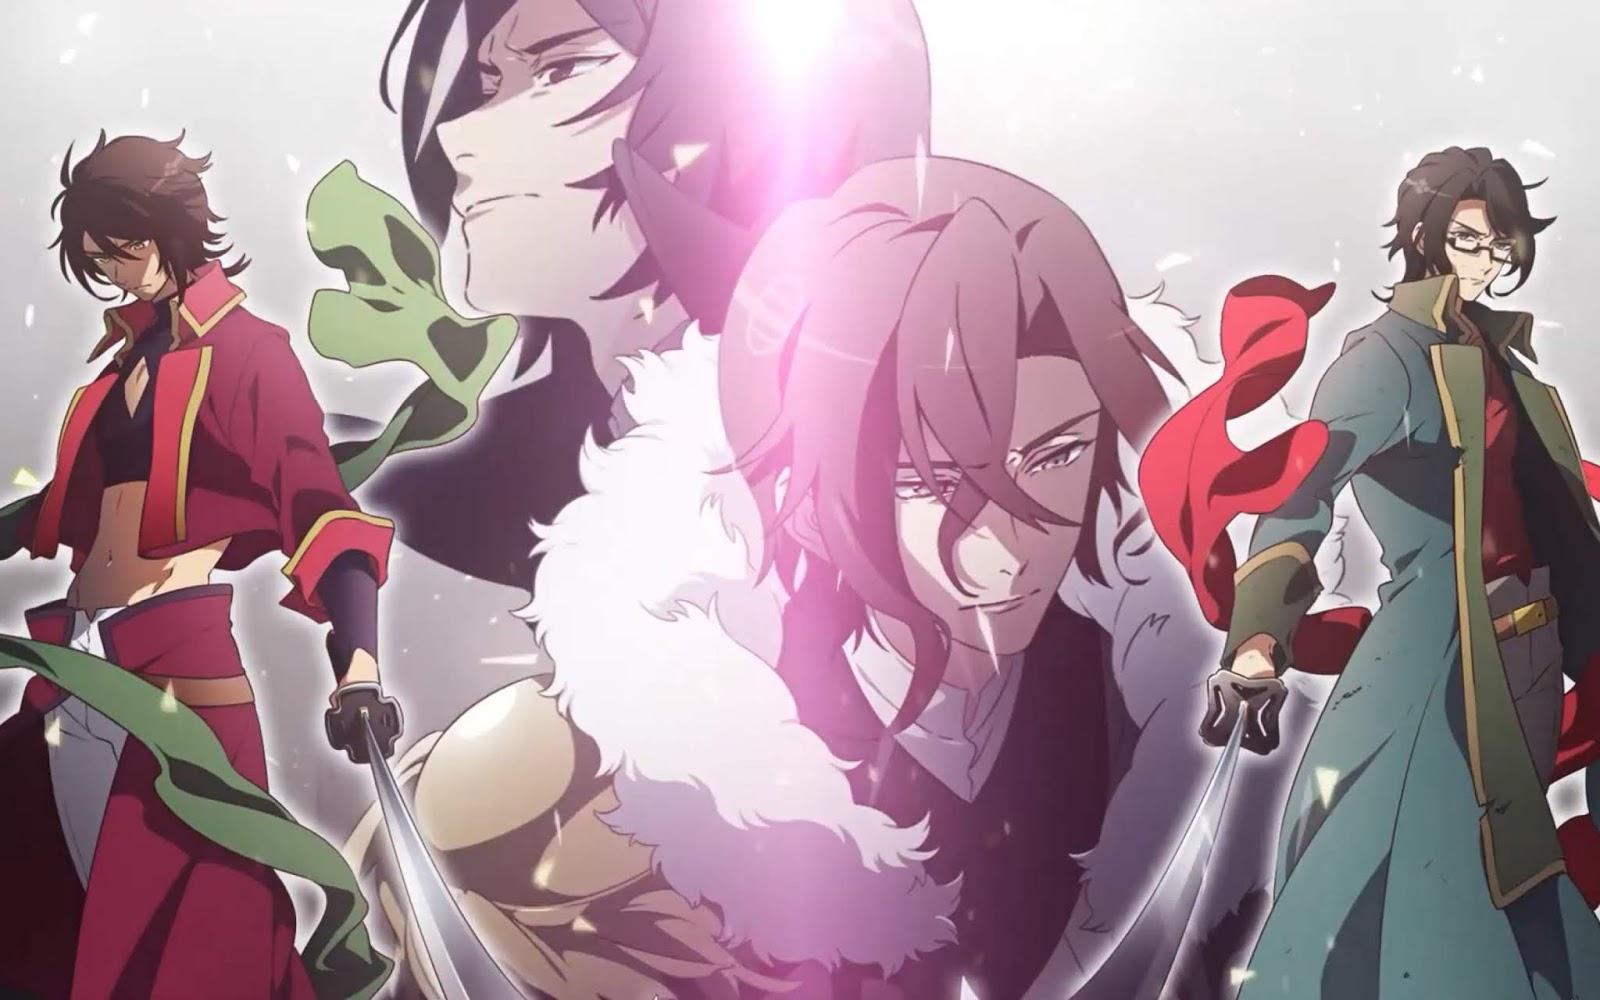 crisis - BAKUMATSU: CRISIS[ 12/ 12] [96 MB] [HD Ligero] [MP4] - Anime Ligero [Descargas]